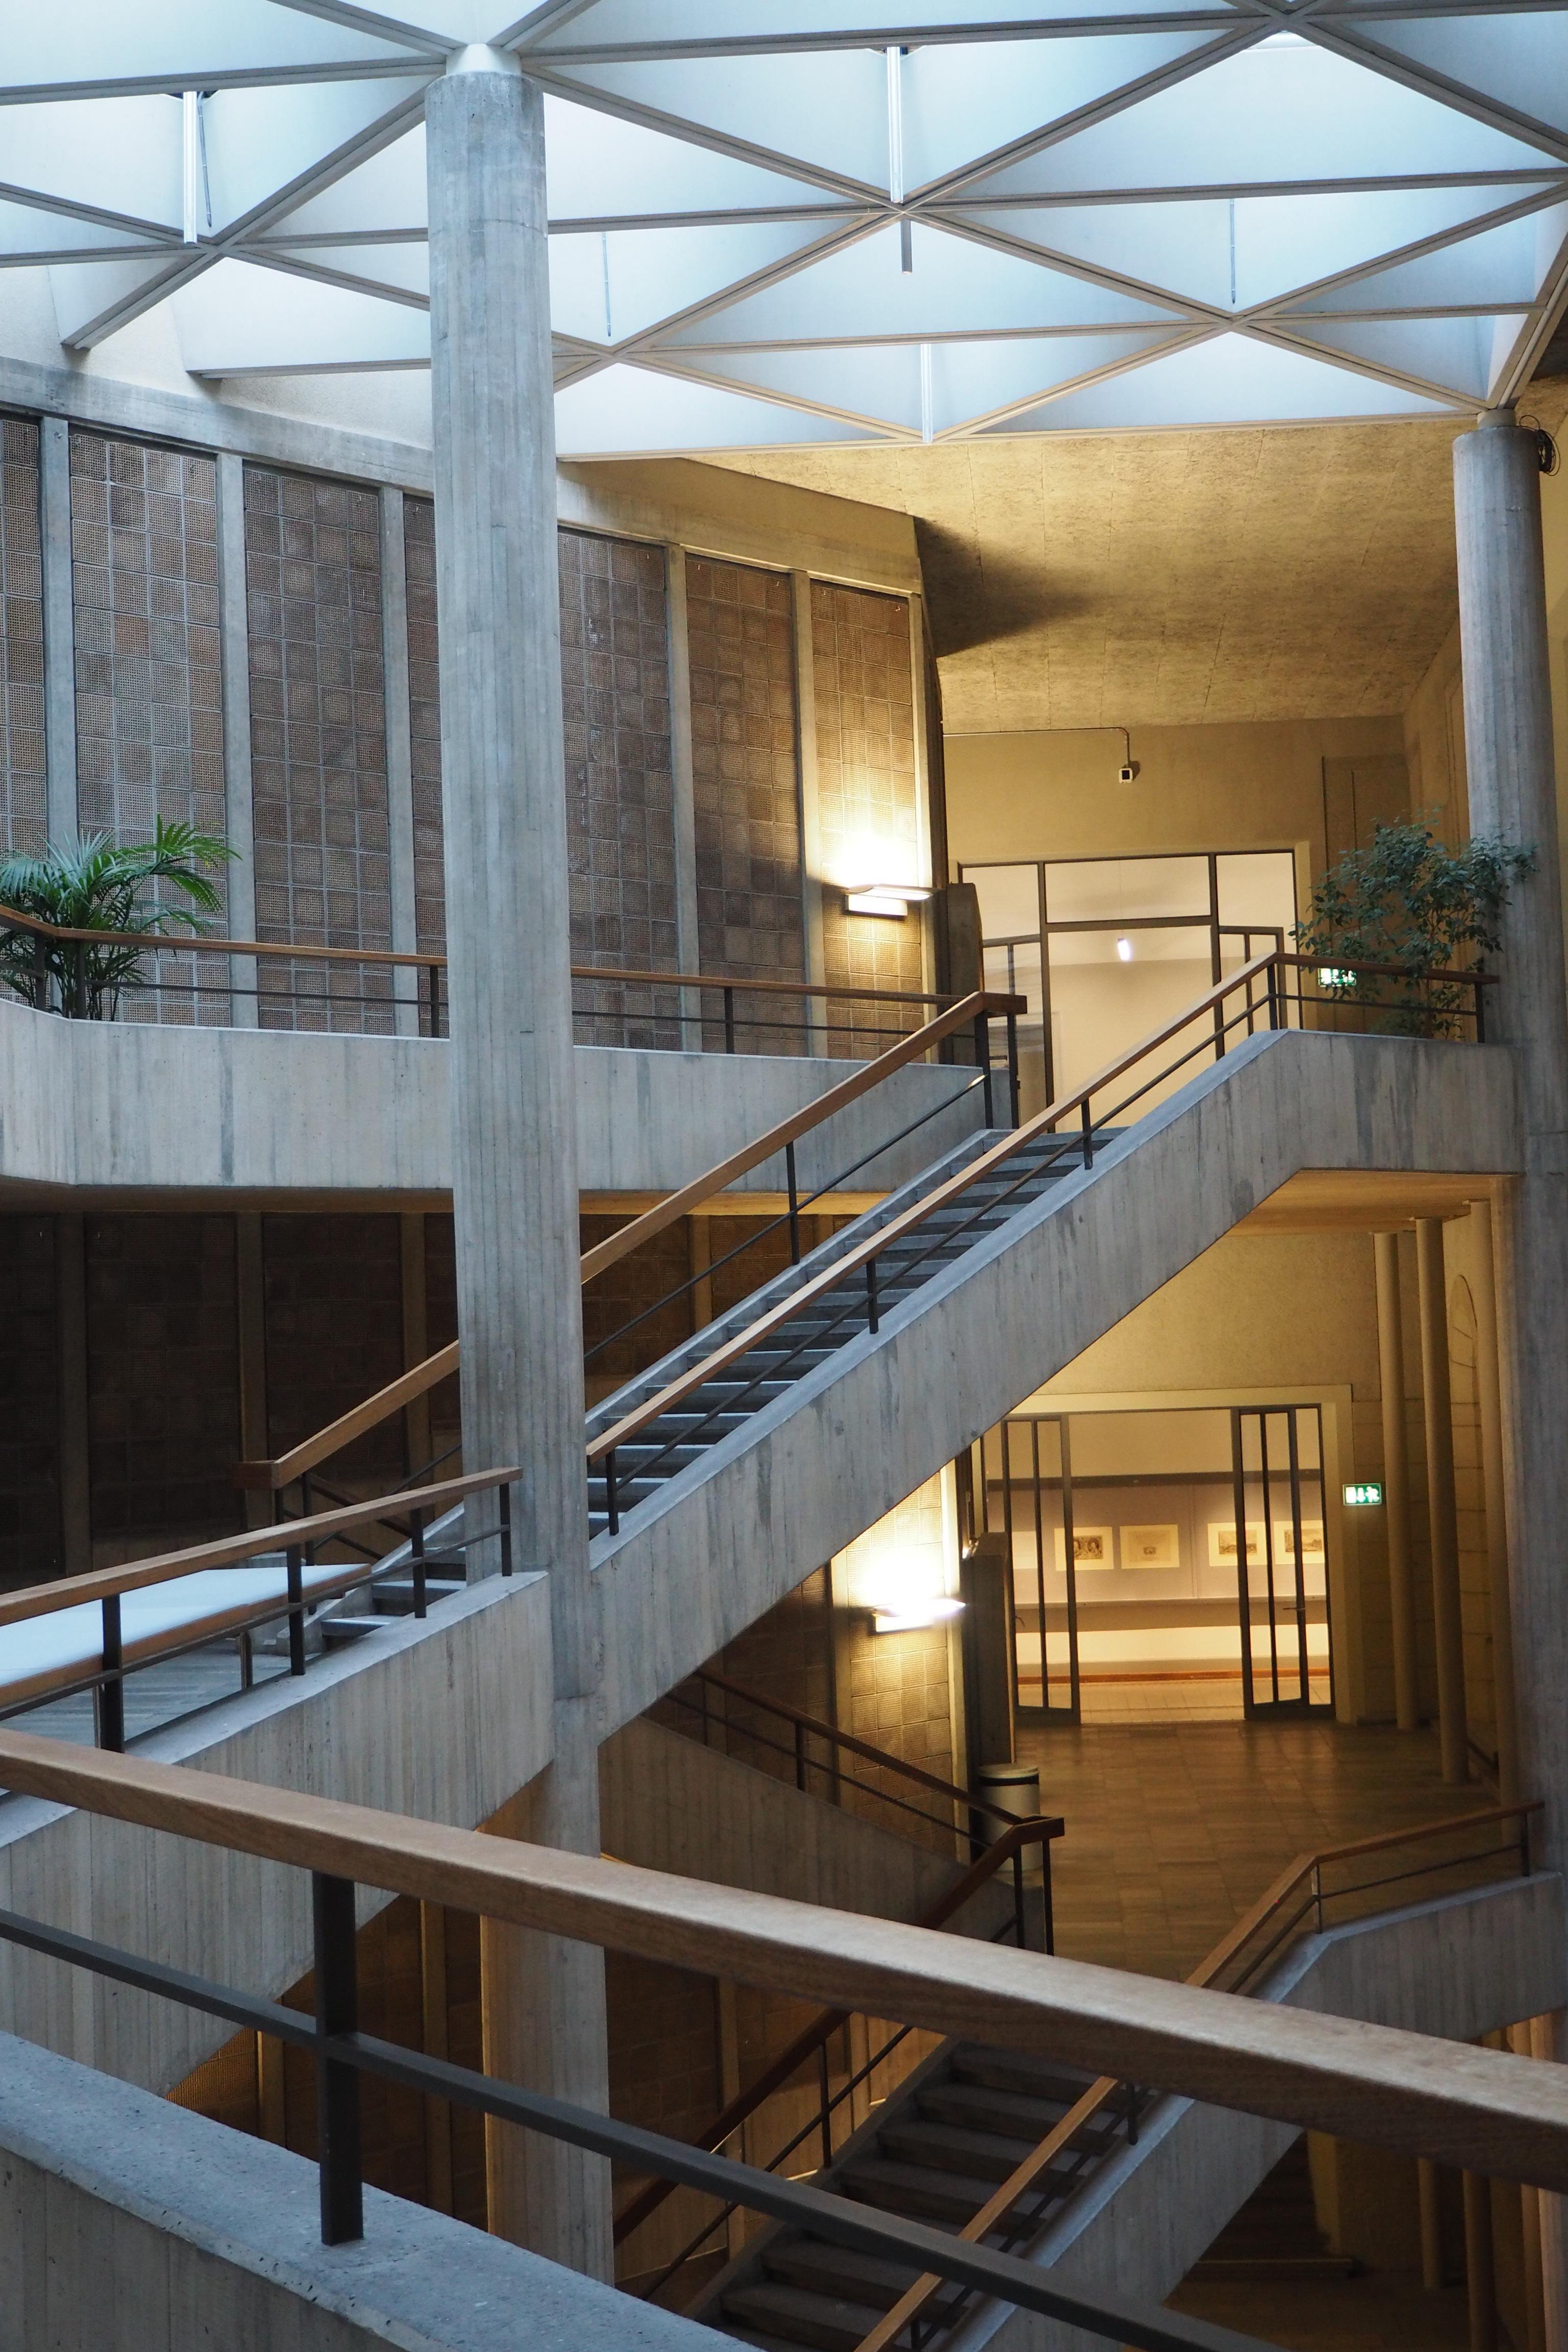 Eth zurich university architecture life is a journey for Architecture zurich